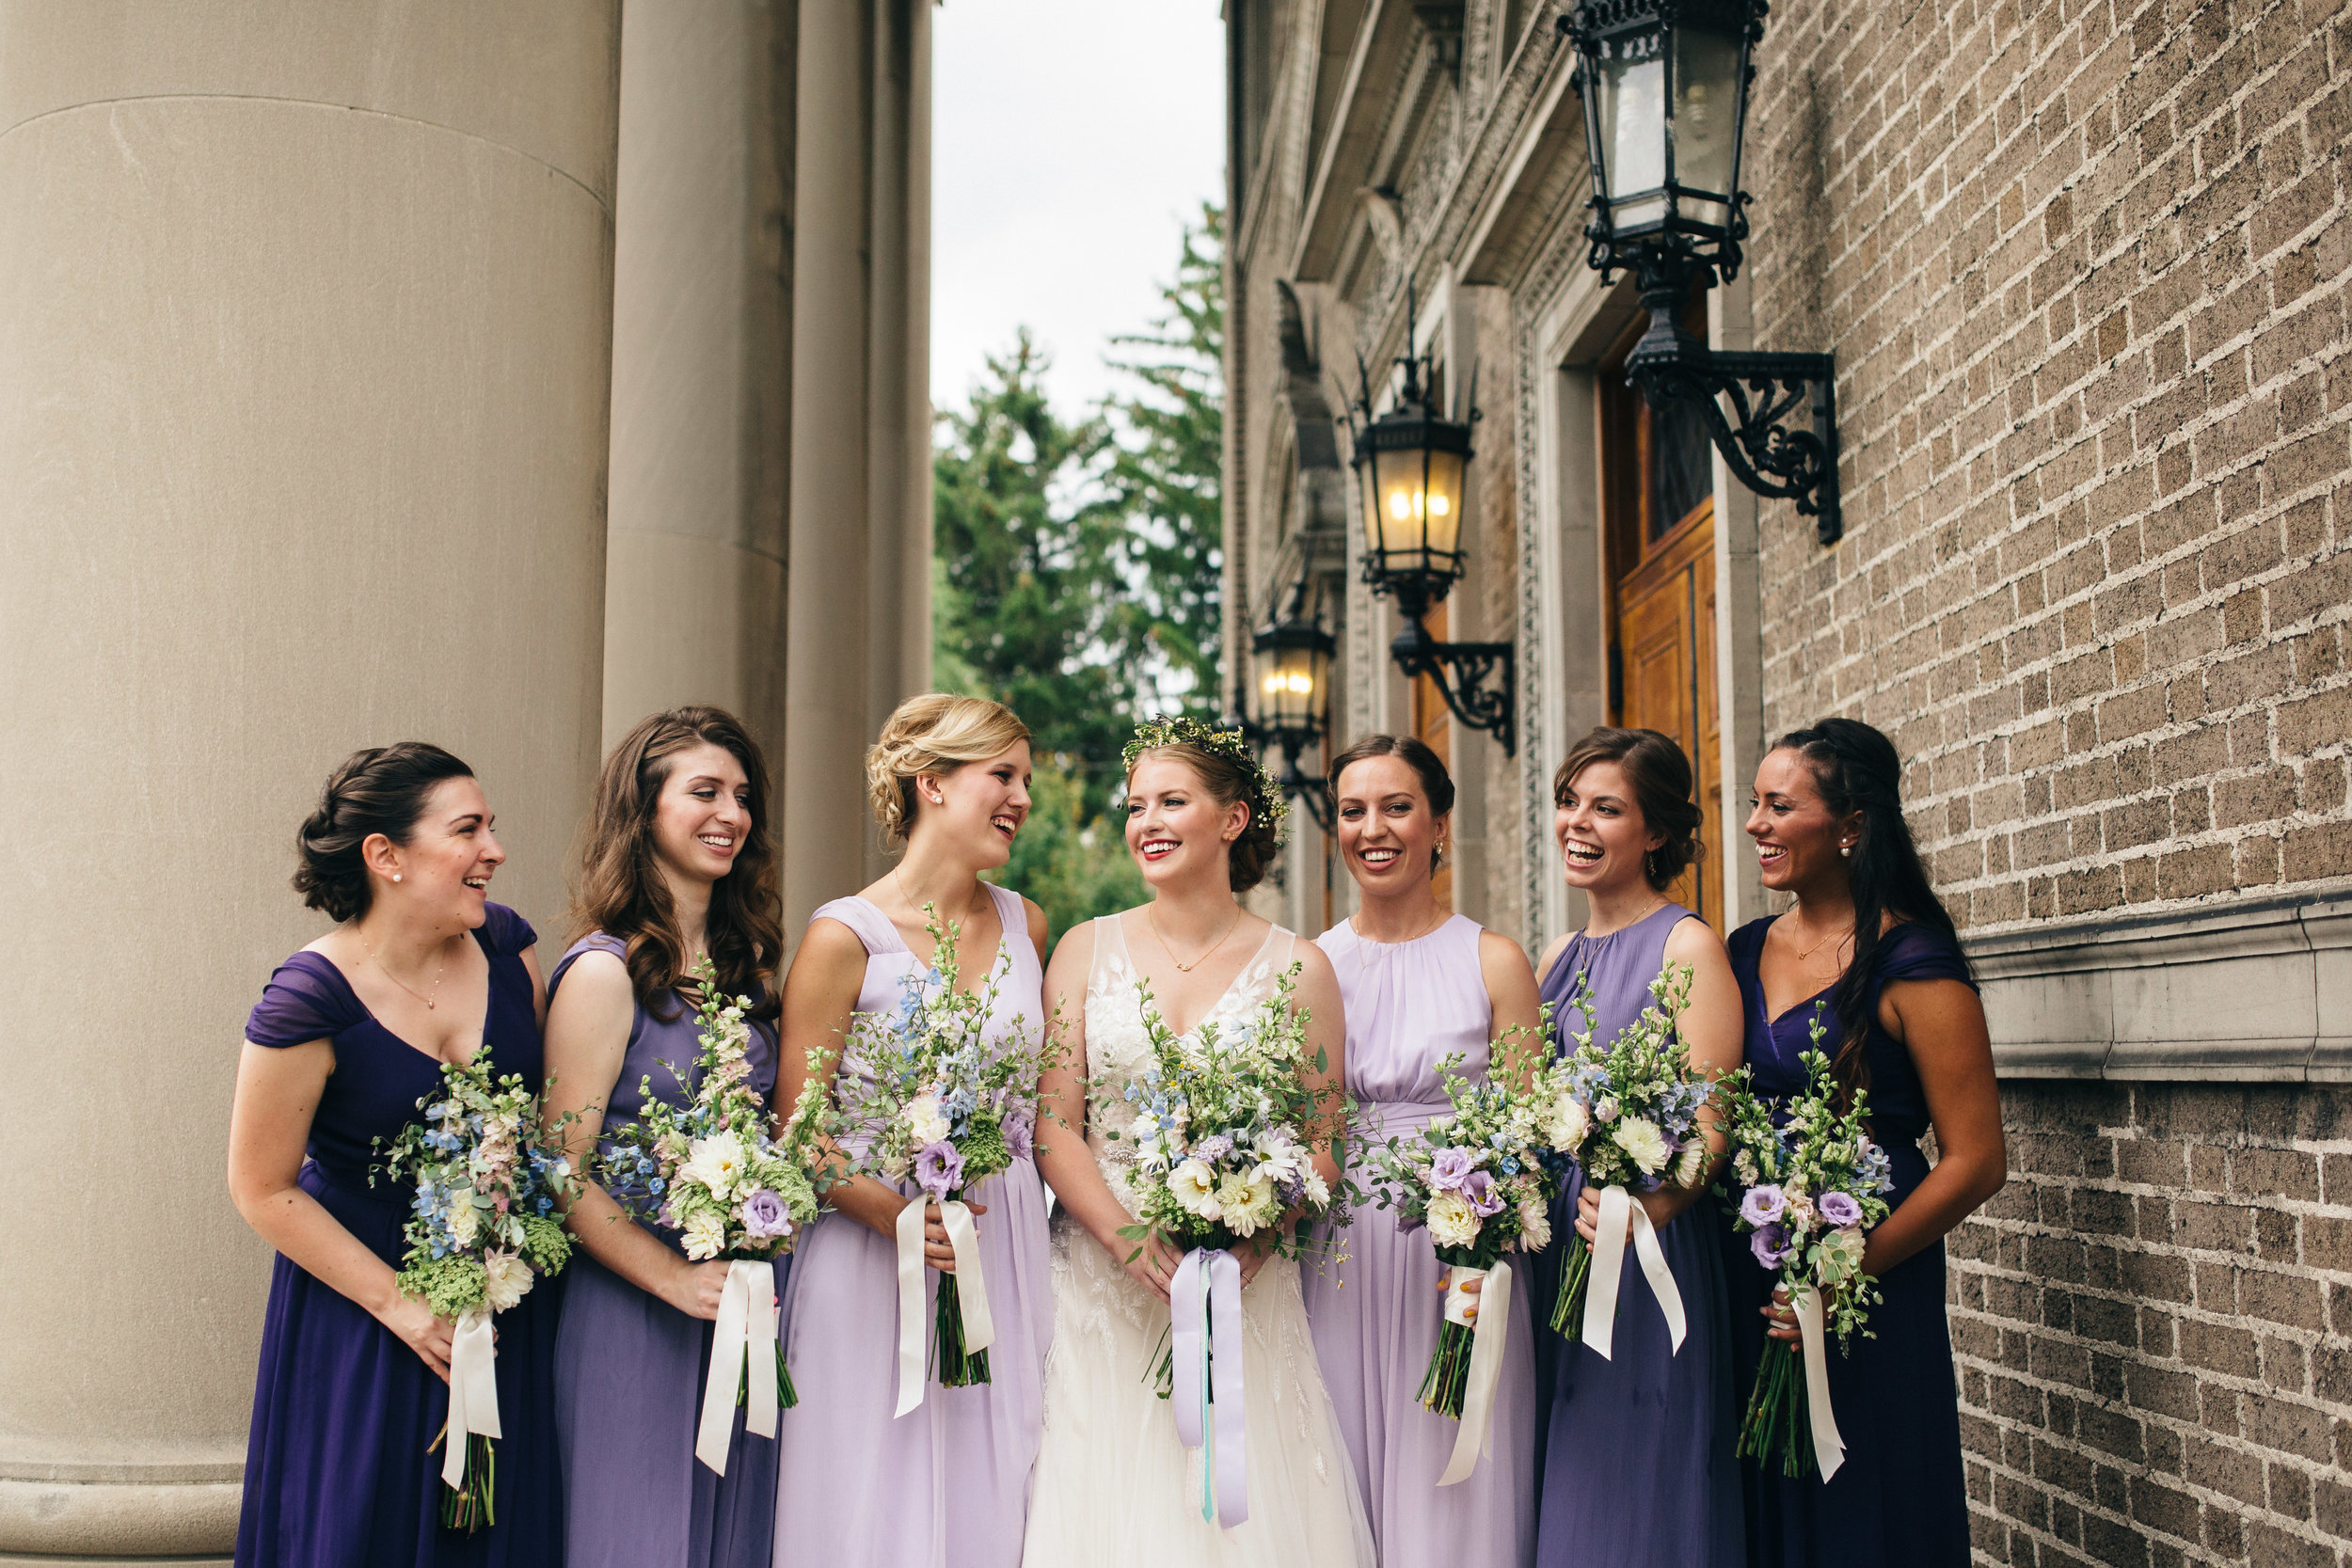 Vintage wedding with ombre bridesmaids dresses in Toledo, Ohio.